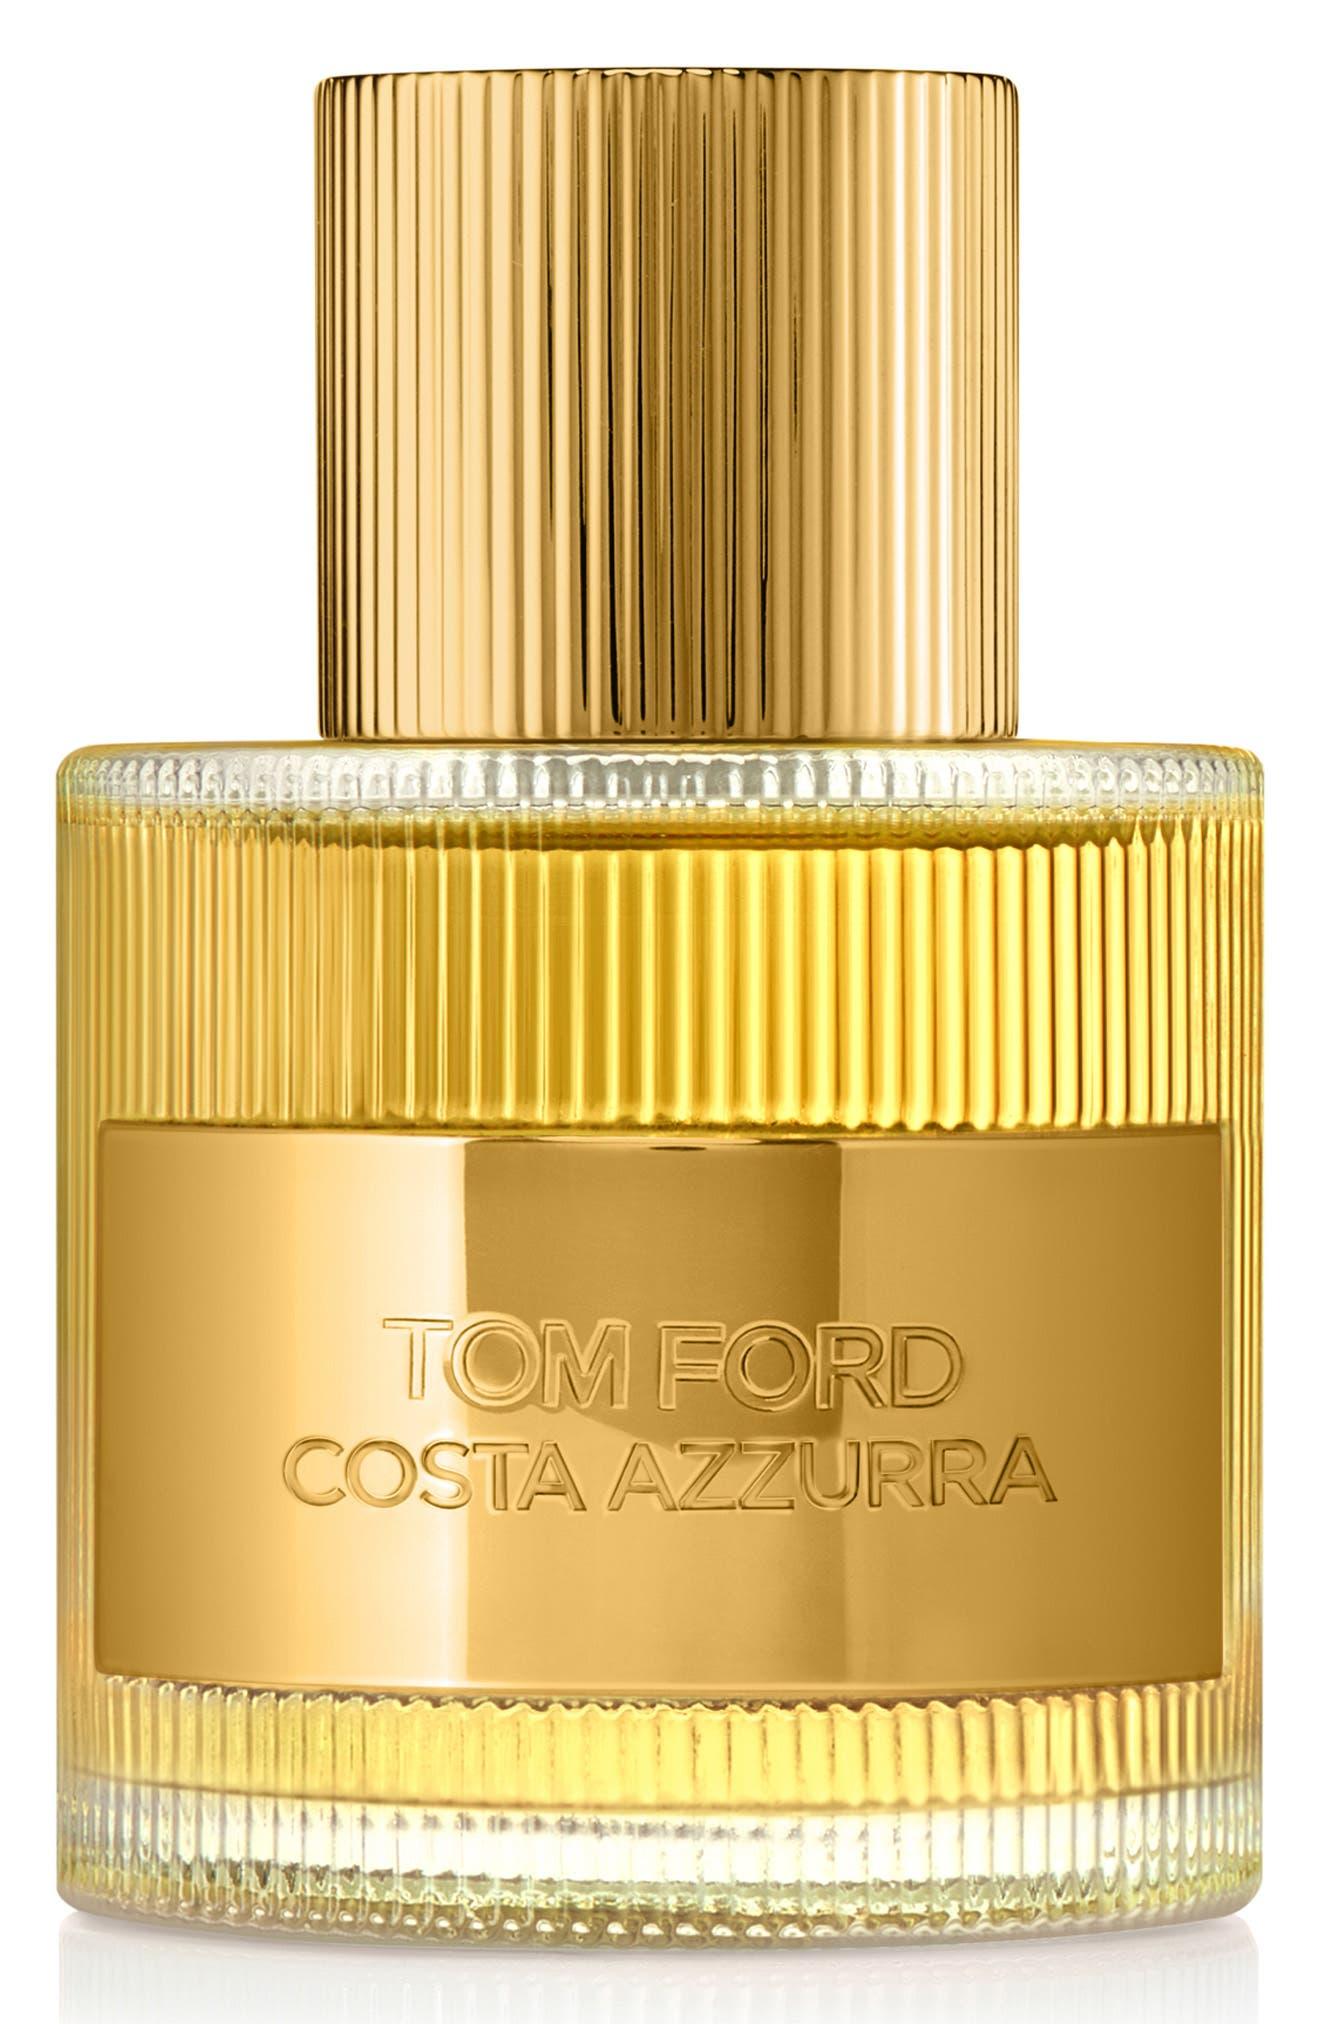 Costa Azzurra Fragrance